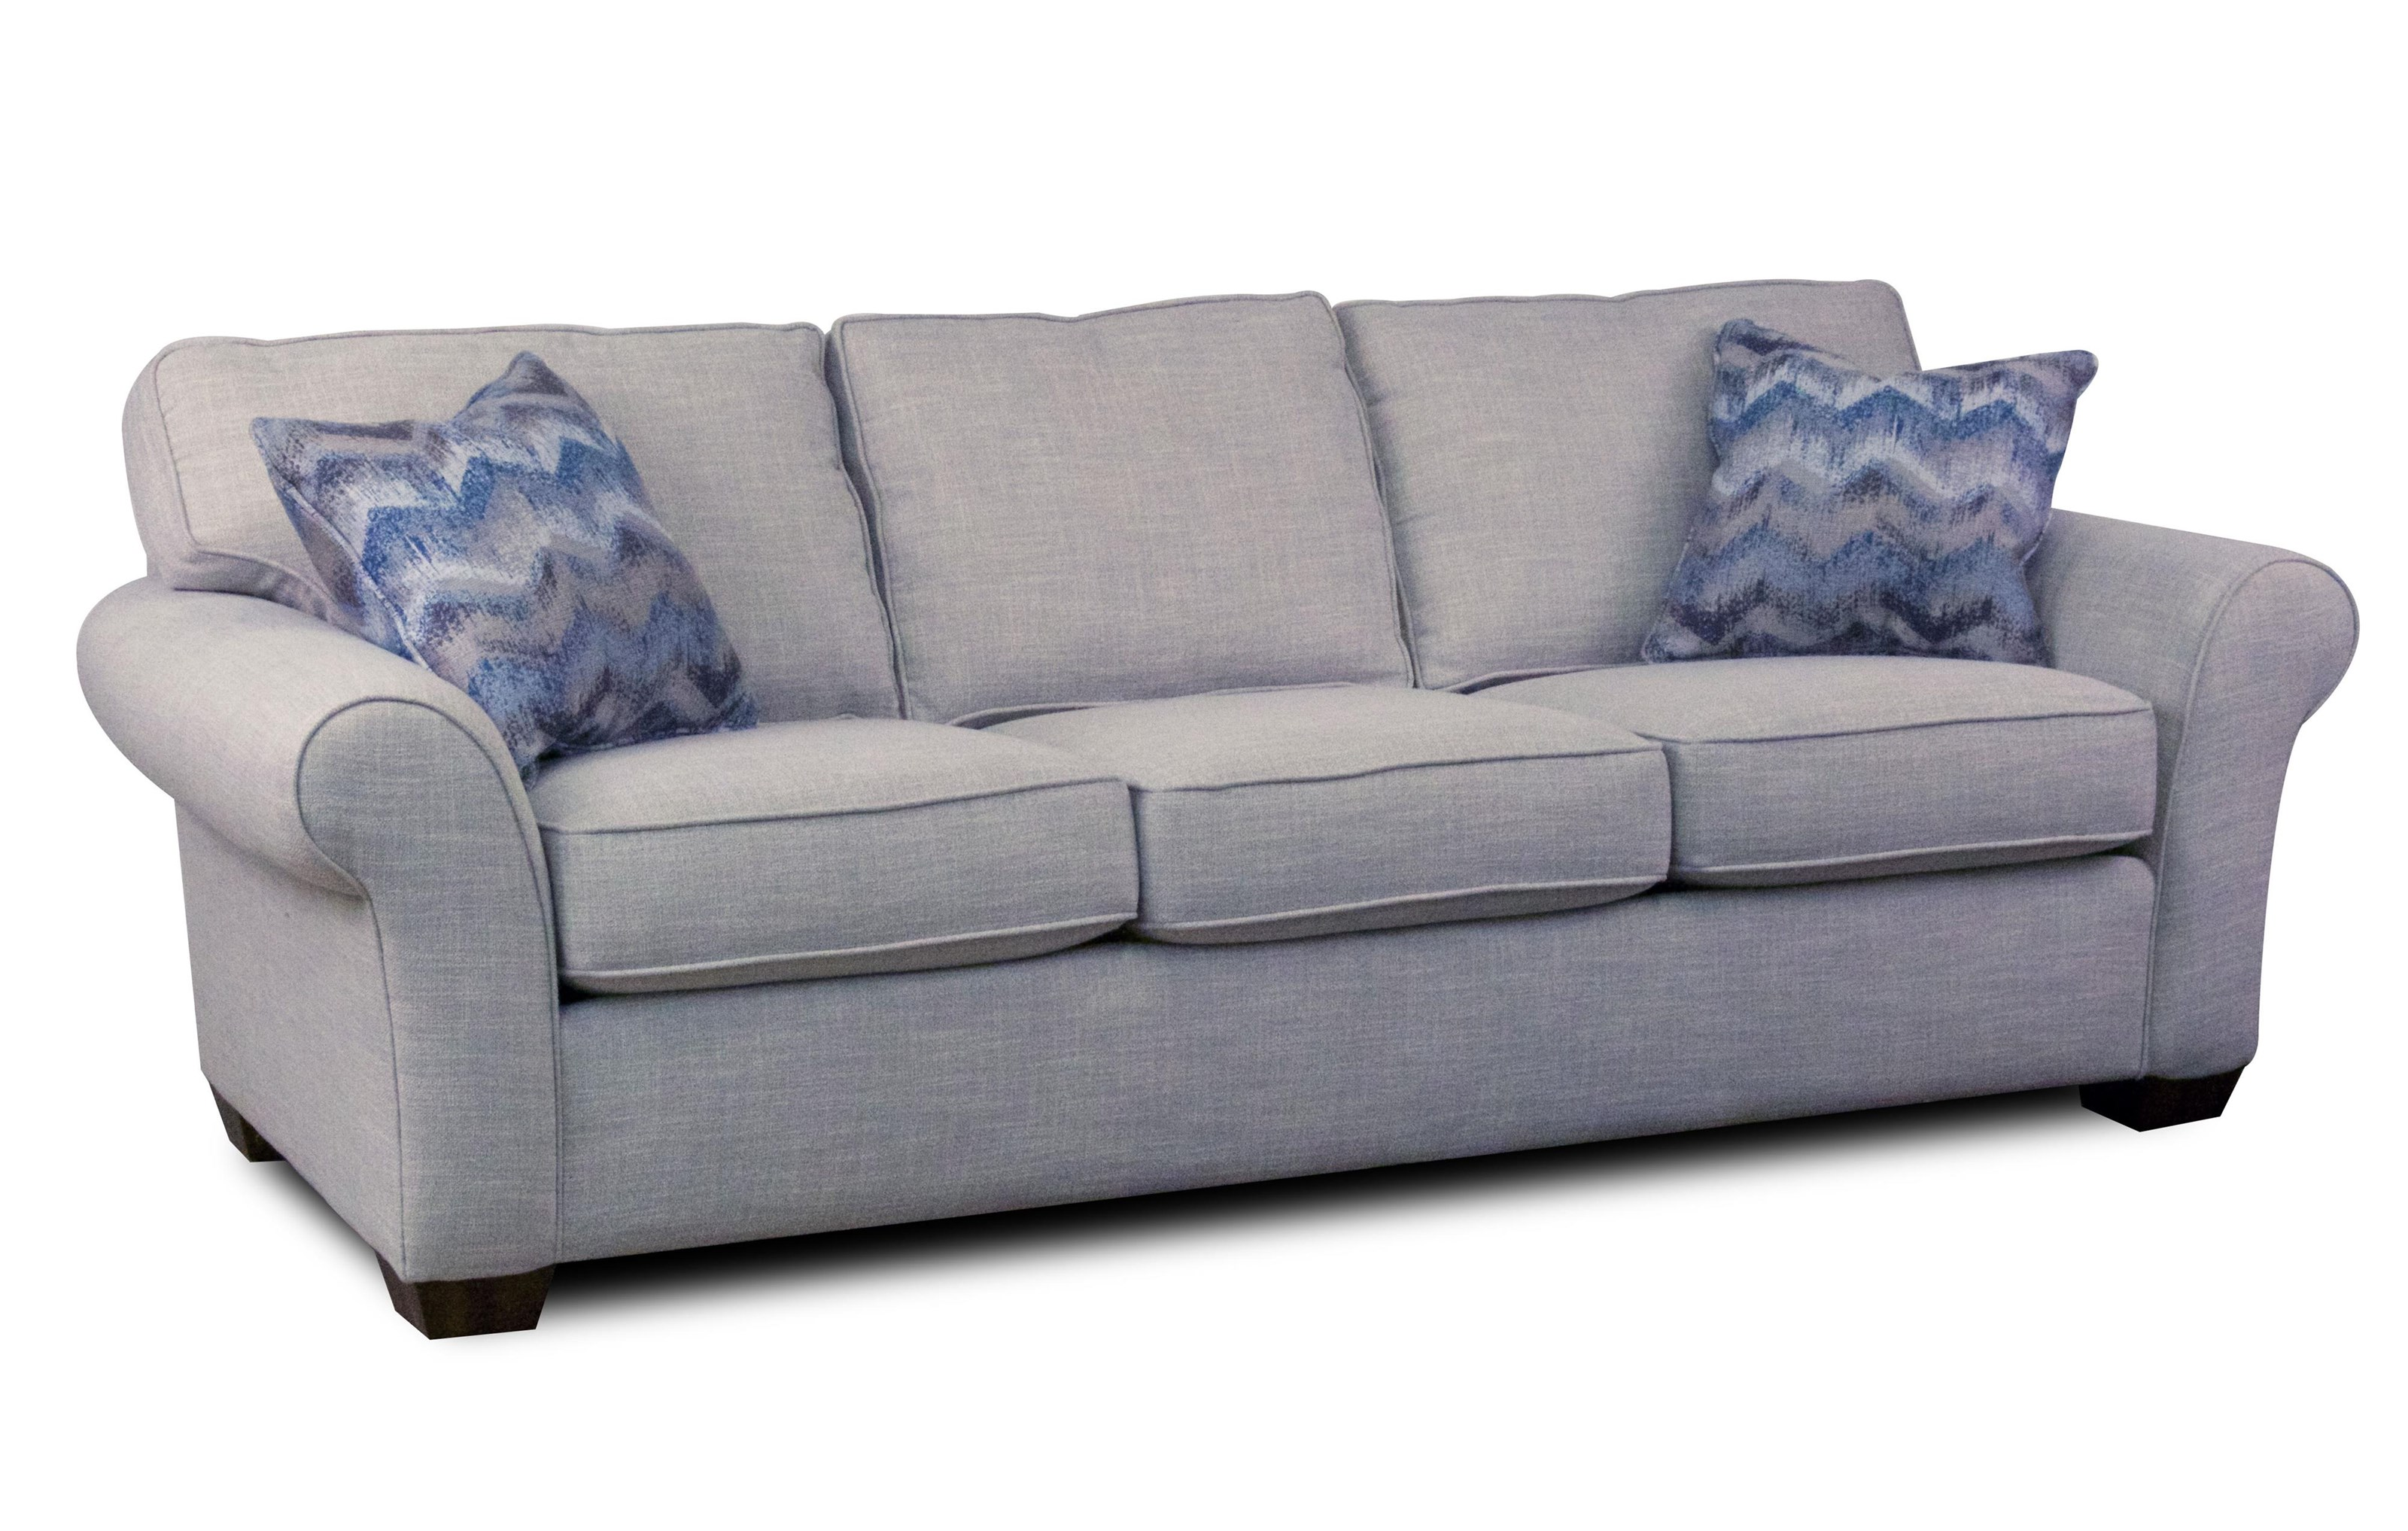 Flexsteel Vail 91 Vail Three Cushion Sofa Ruby Gordon Furniture Mattresses Sofas